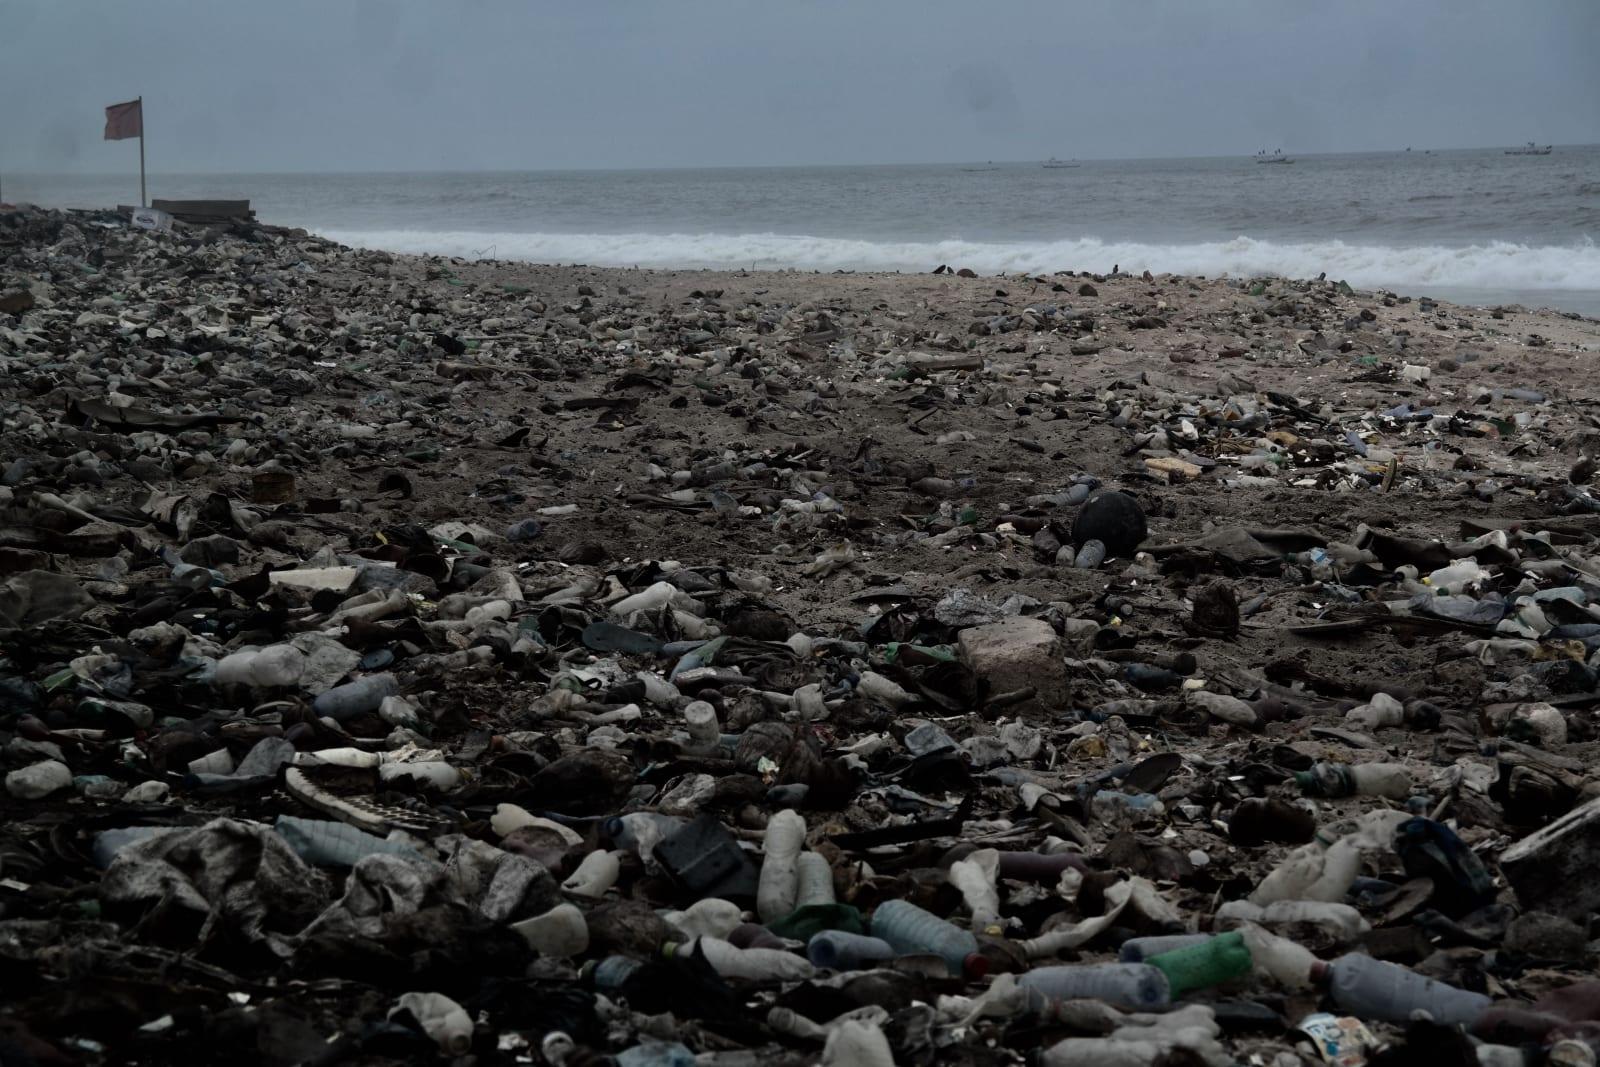 Latifah Iddriss treasures at shore ii (inside earth) 42 x 27.67 cm 14.8 x 21 cm Digital print